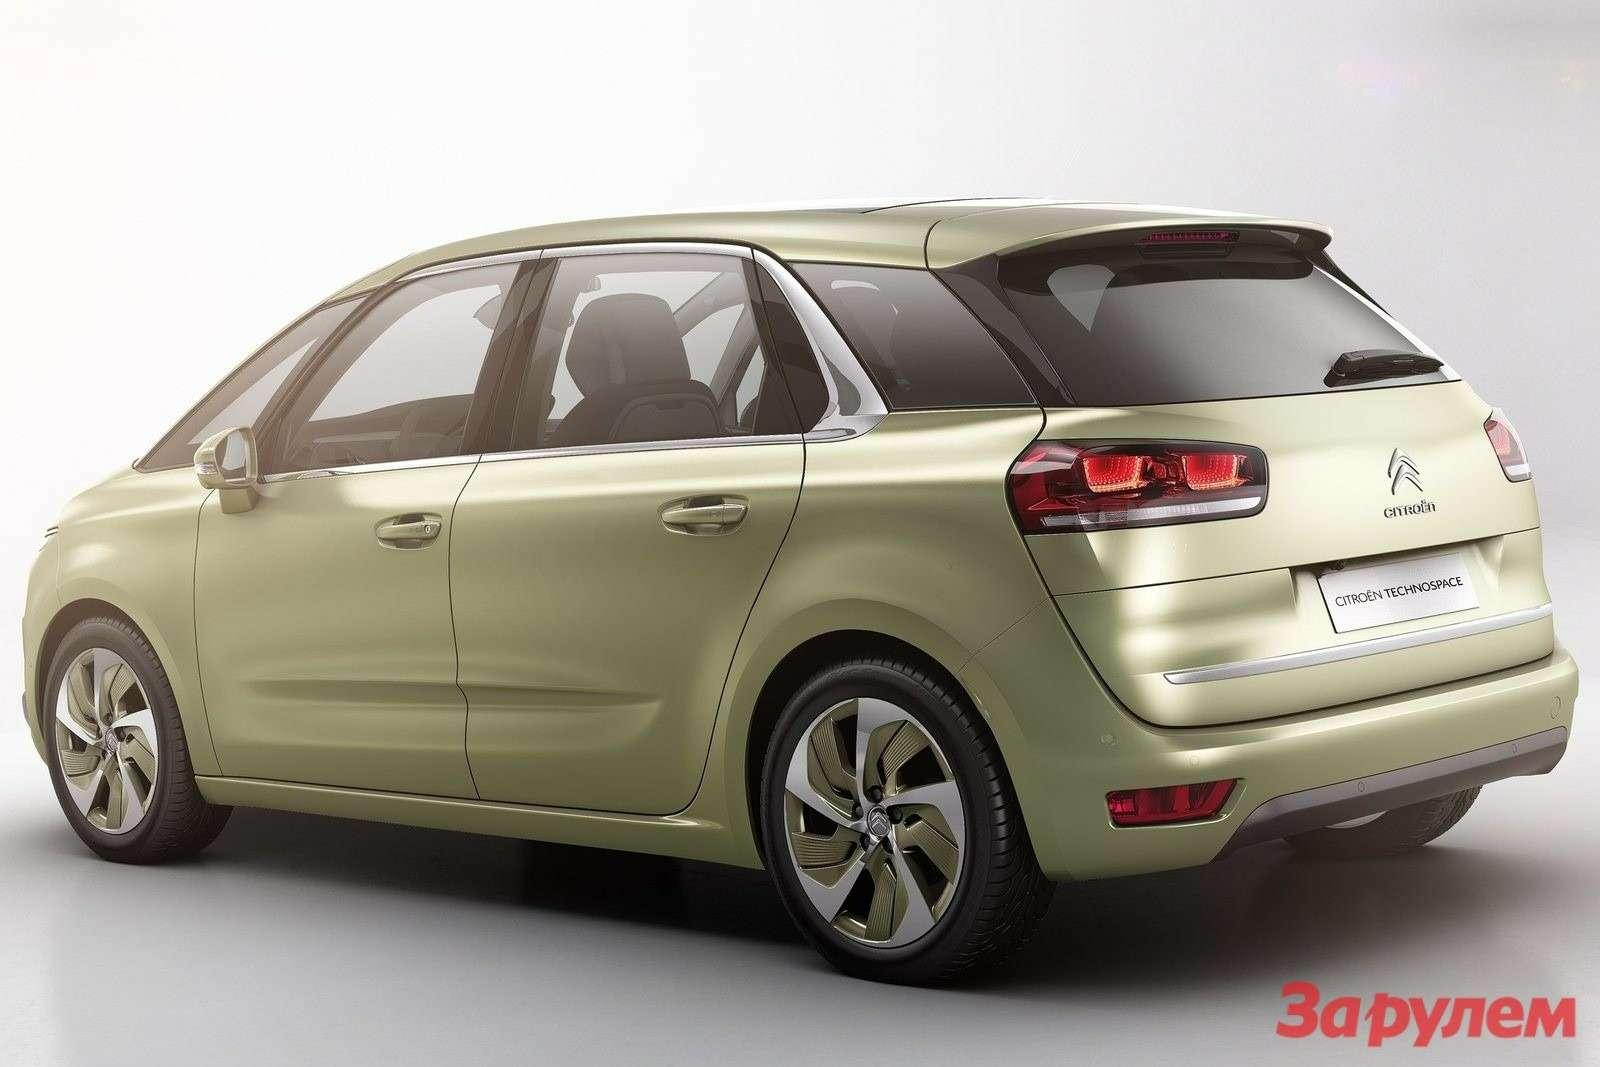 Citroen Technospace Concept side-rear view